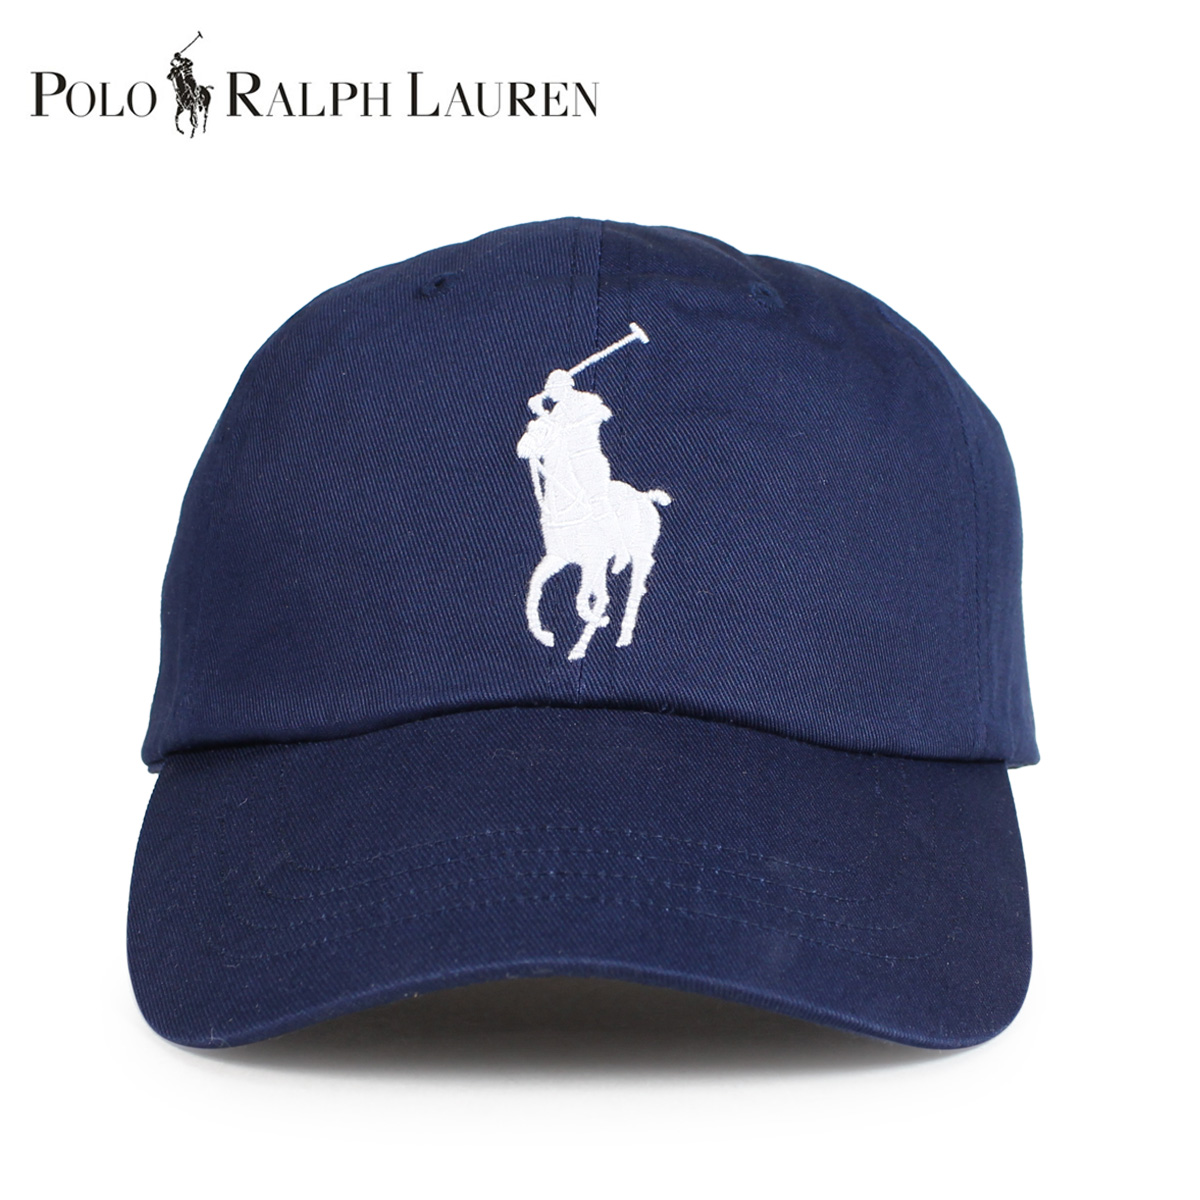 eae5e915e00a4d POLO RALPH LAUREN BIG PONY CHINO BASEBALL CAP polo Ralph Lauren cap hat men  gap Dis ...